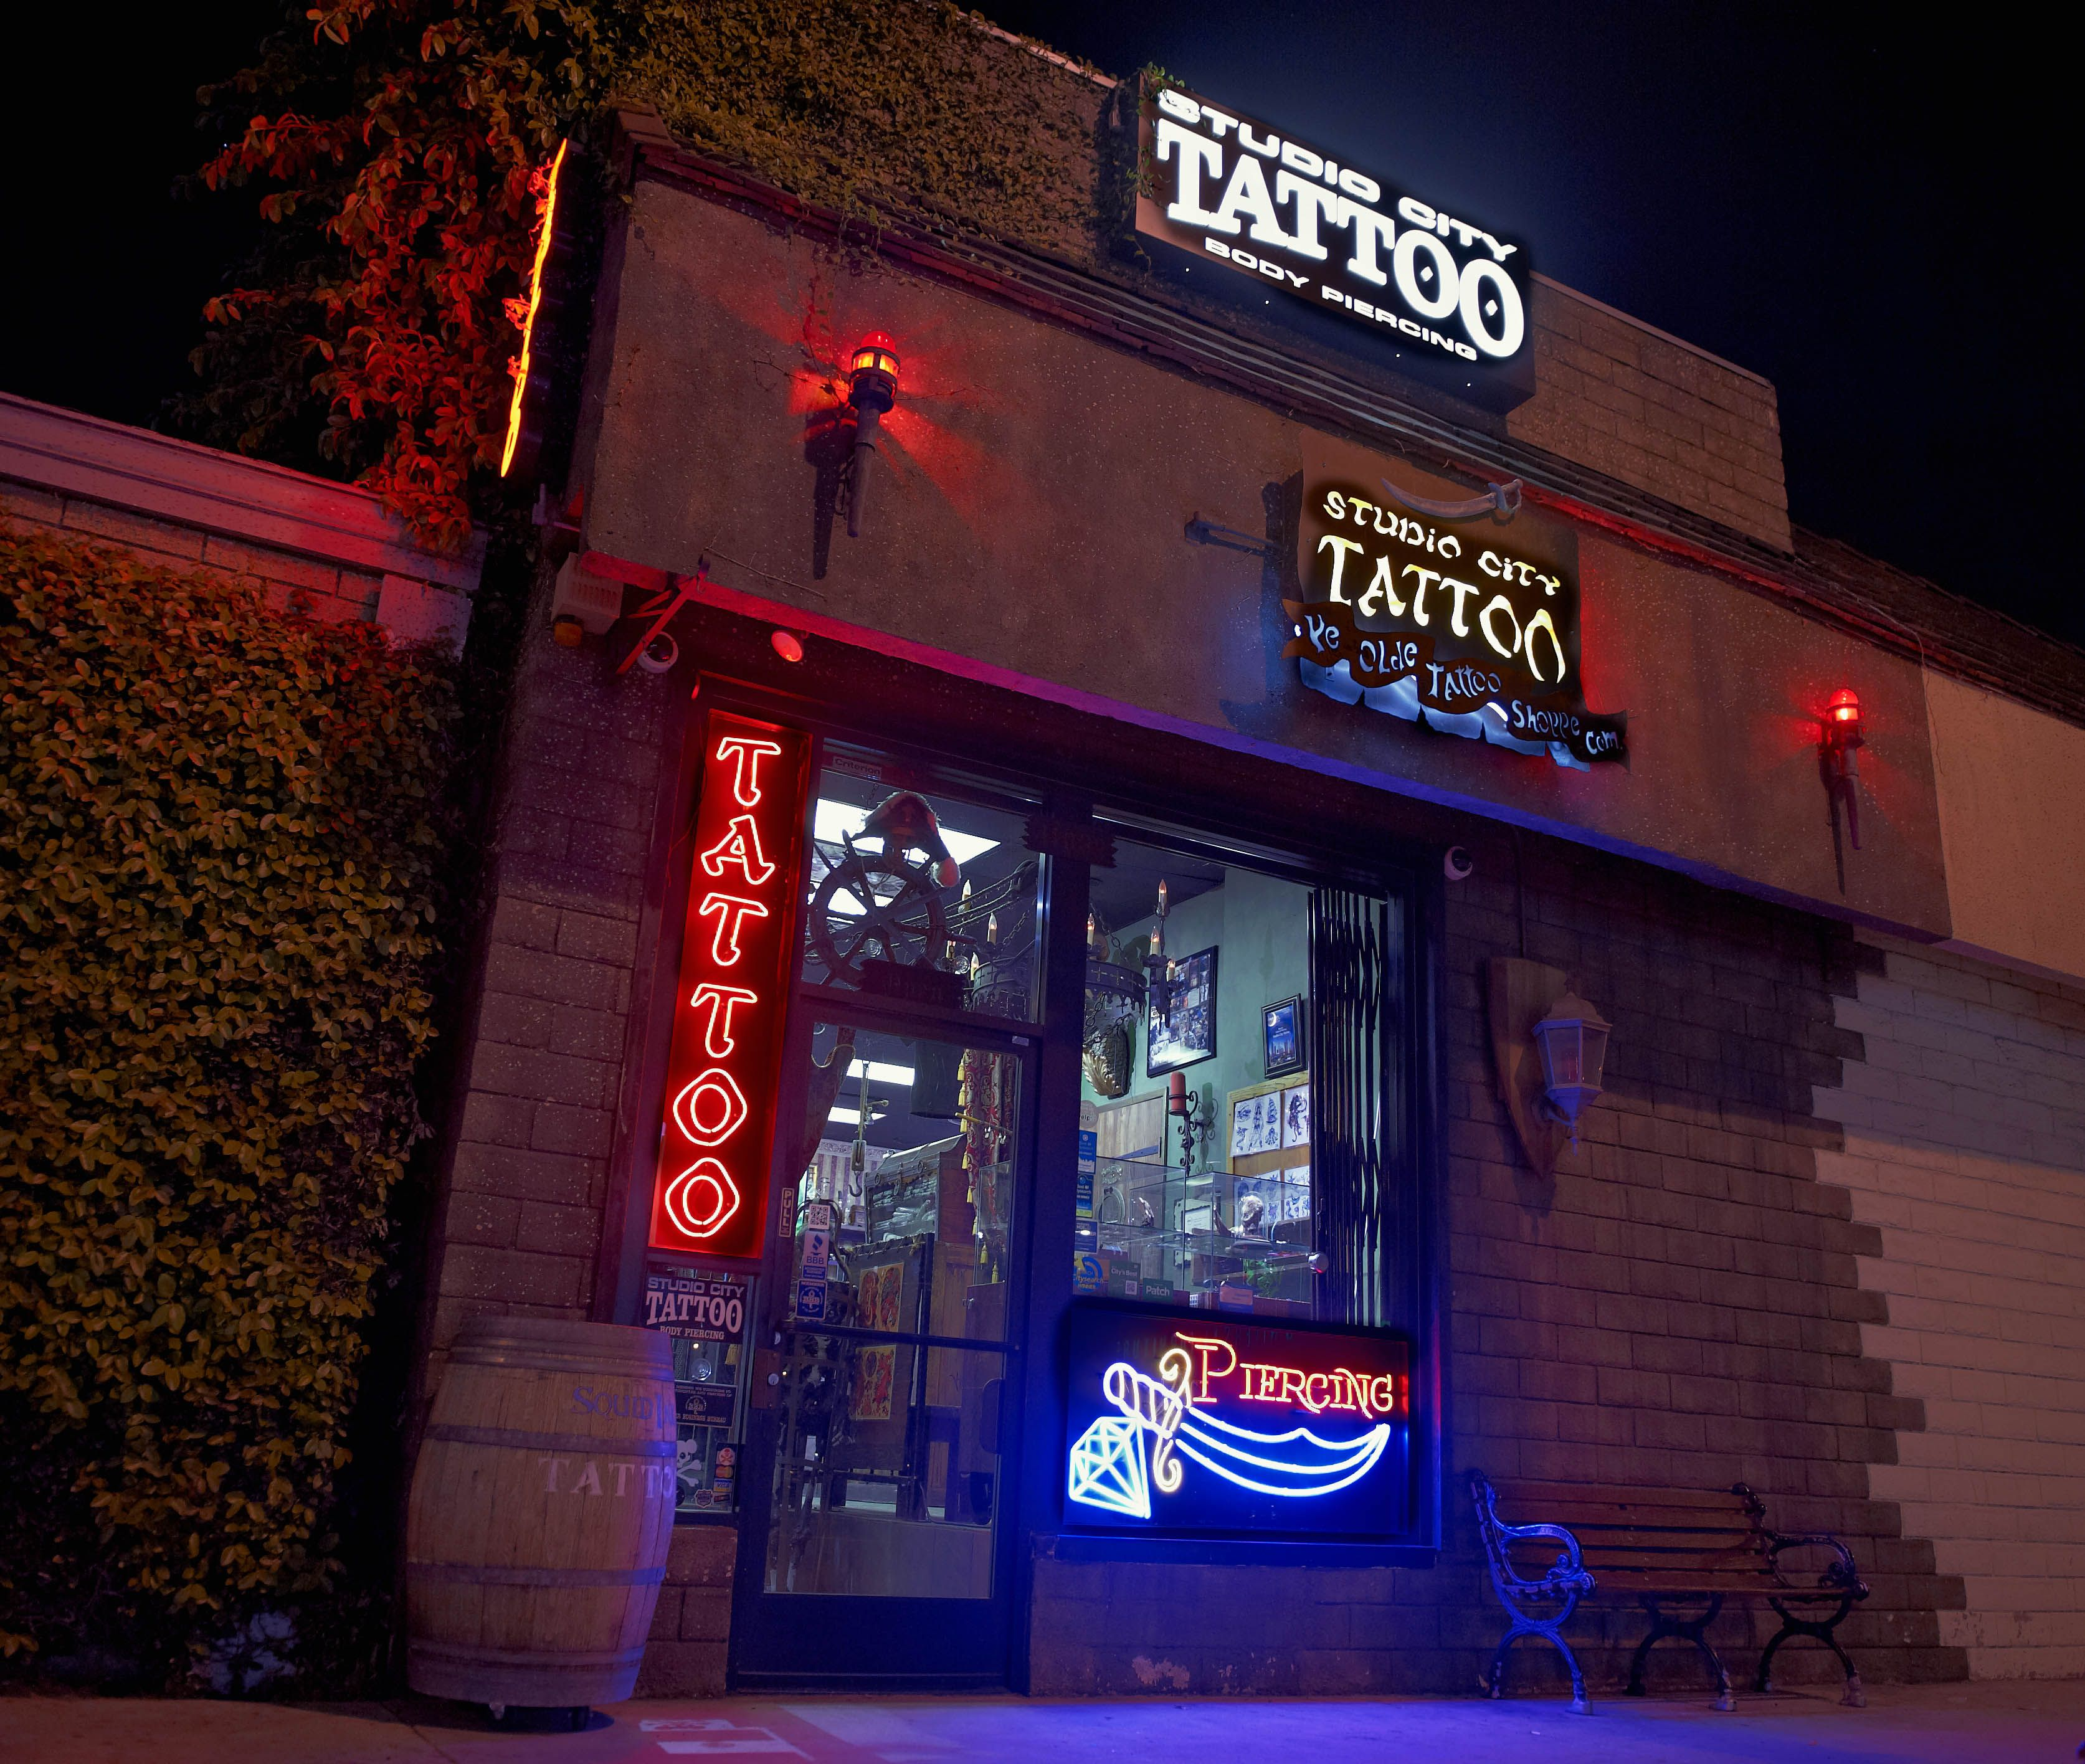 Studio City Tattoo Exterior Tattoo Shop Studio City City Tattoo